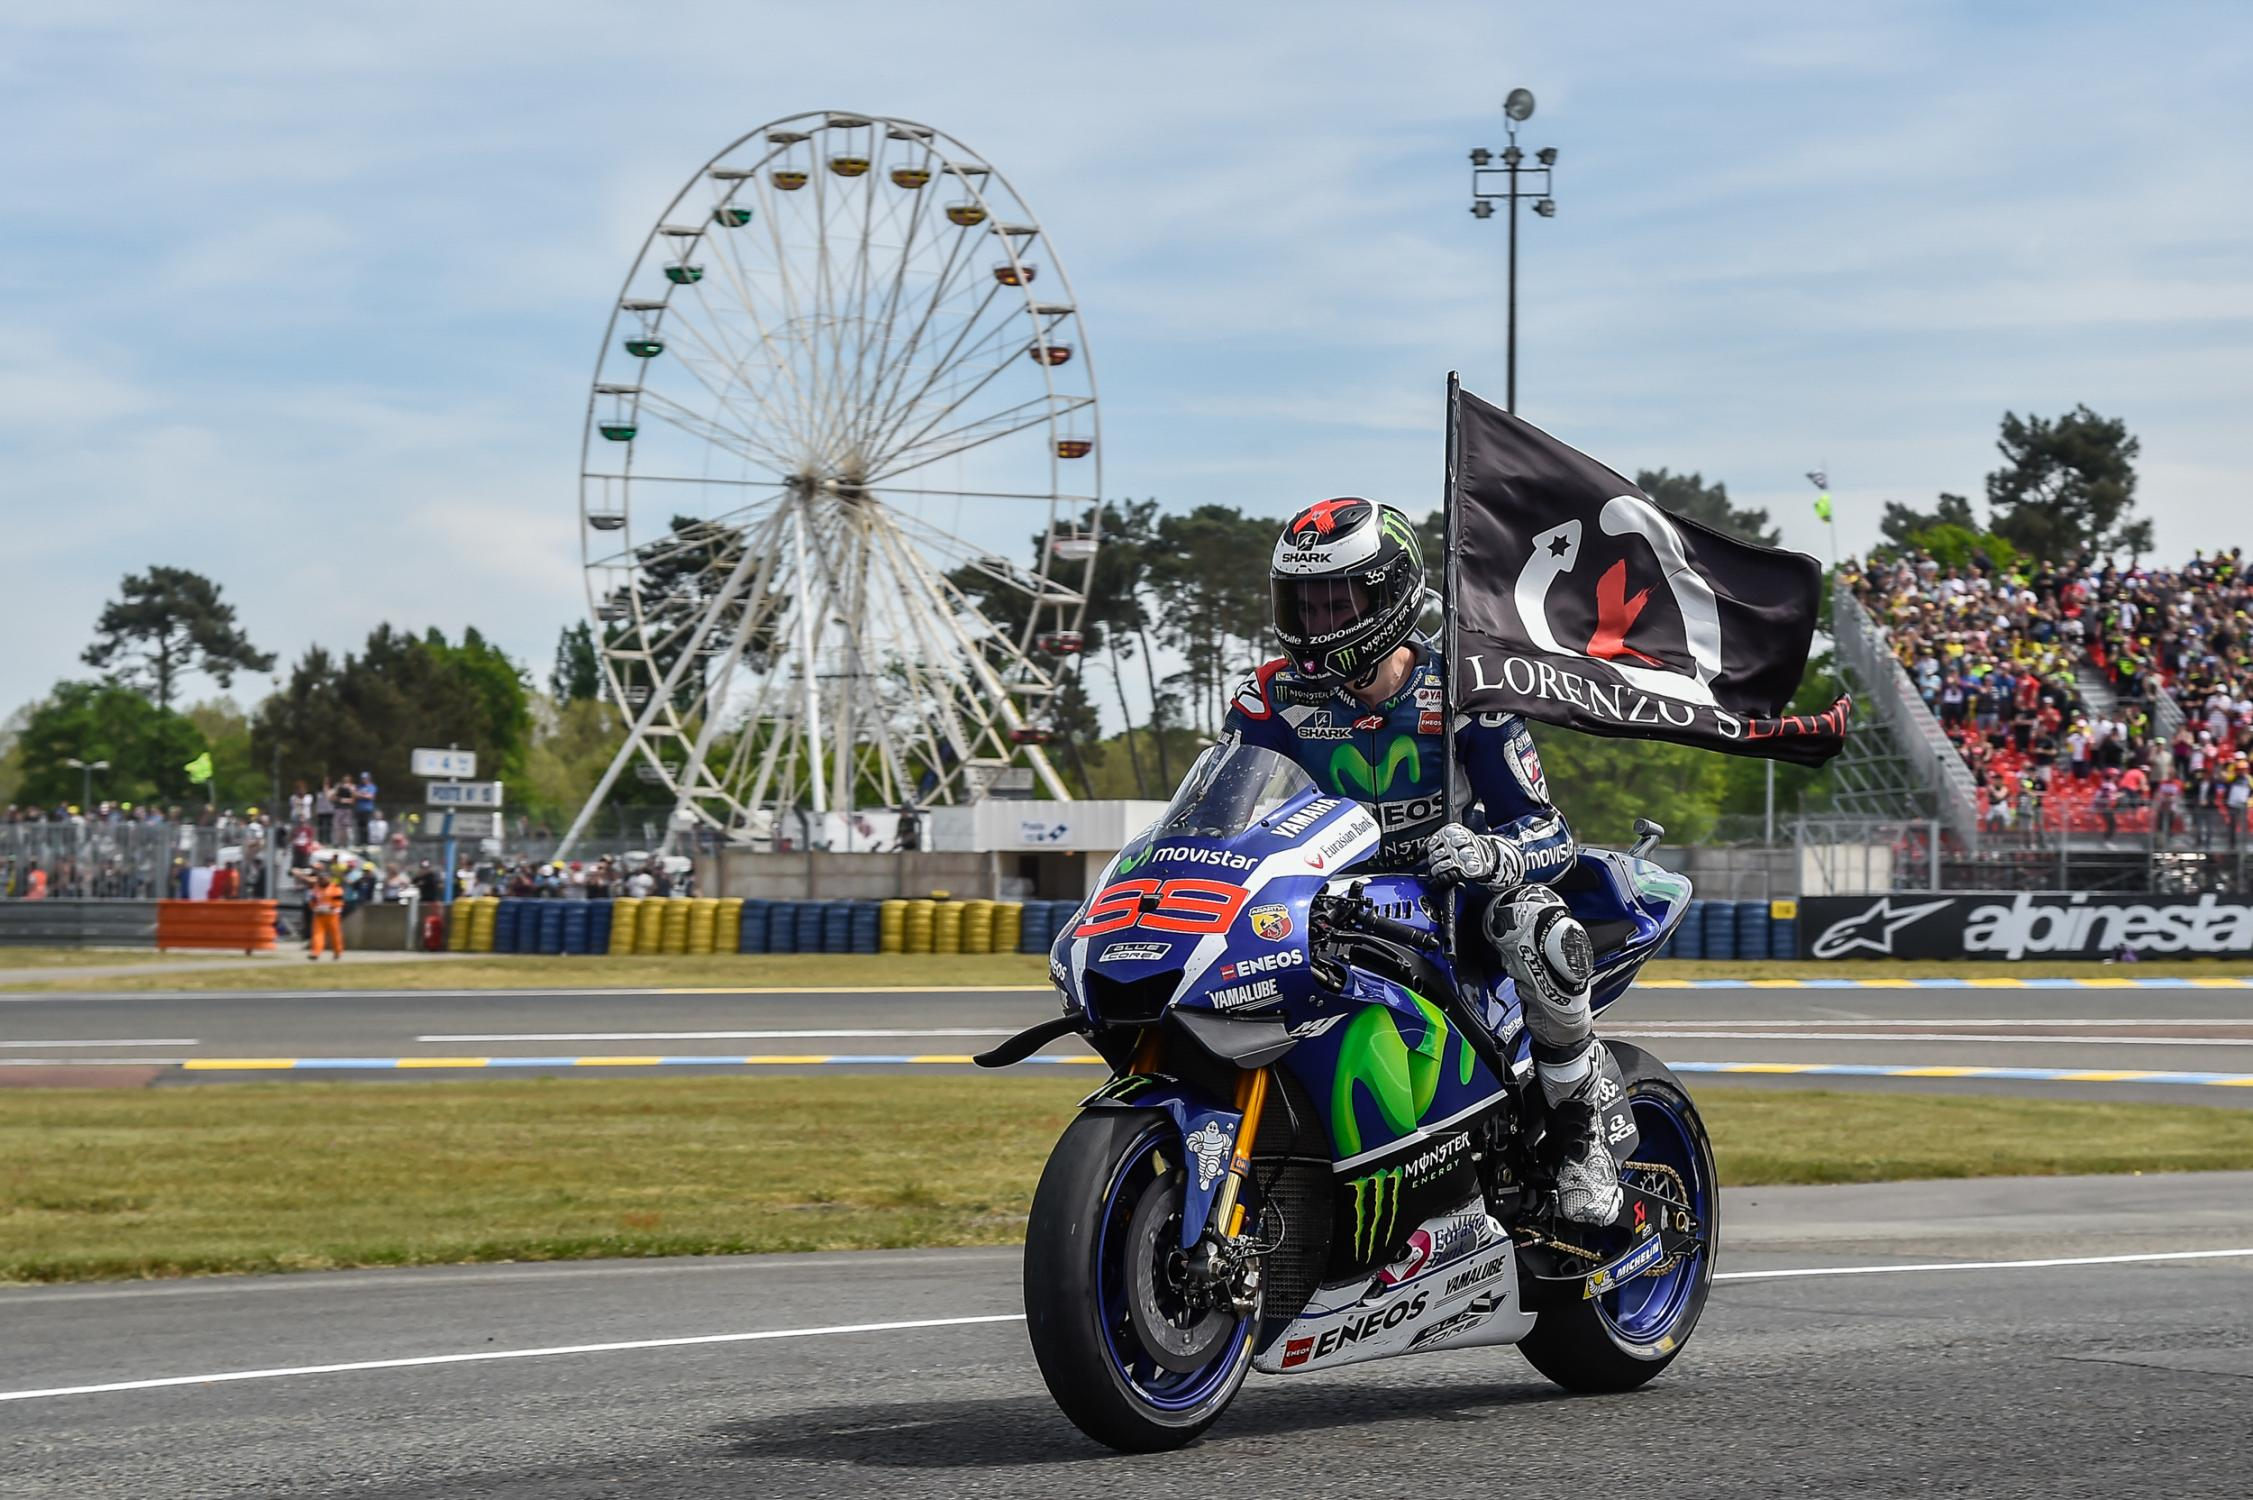 [GP] Le Mans _g4s7023.gallery_full_top_fullscreen